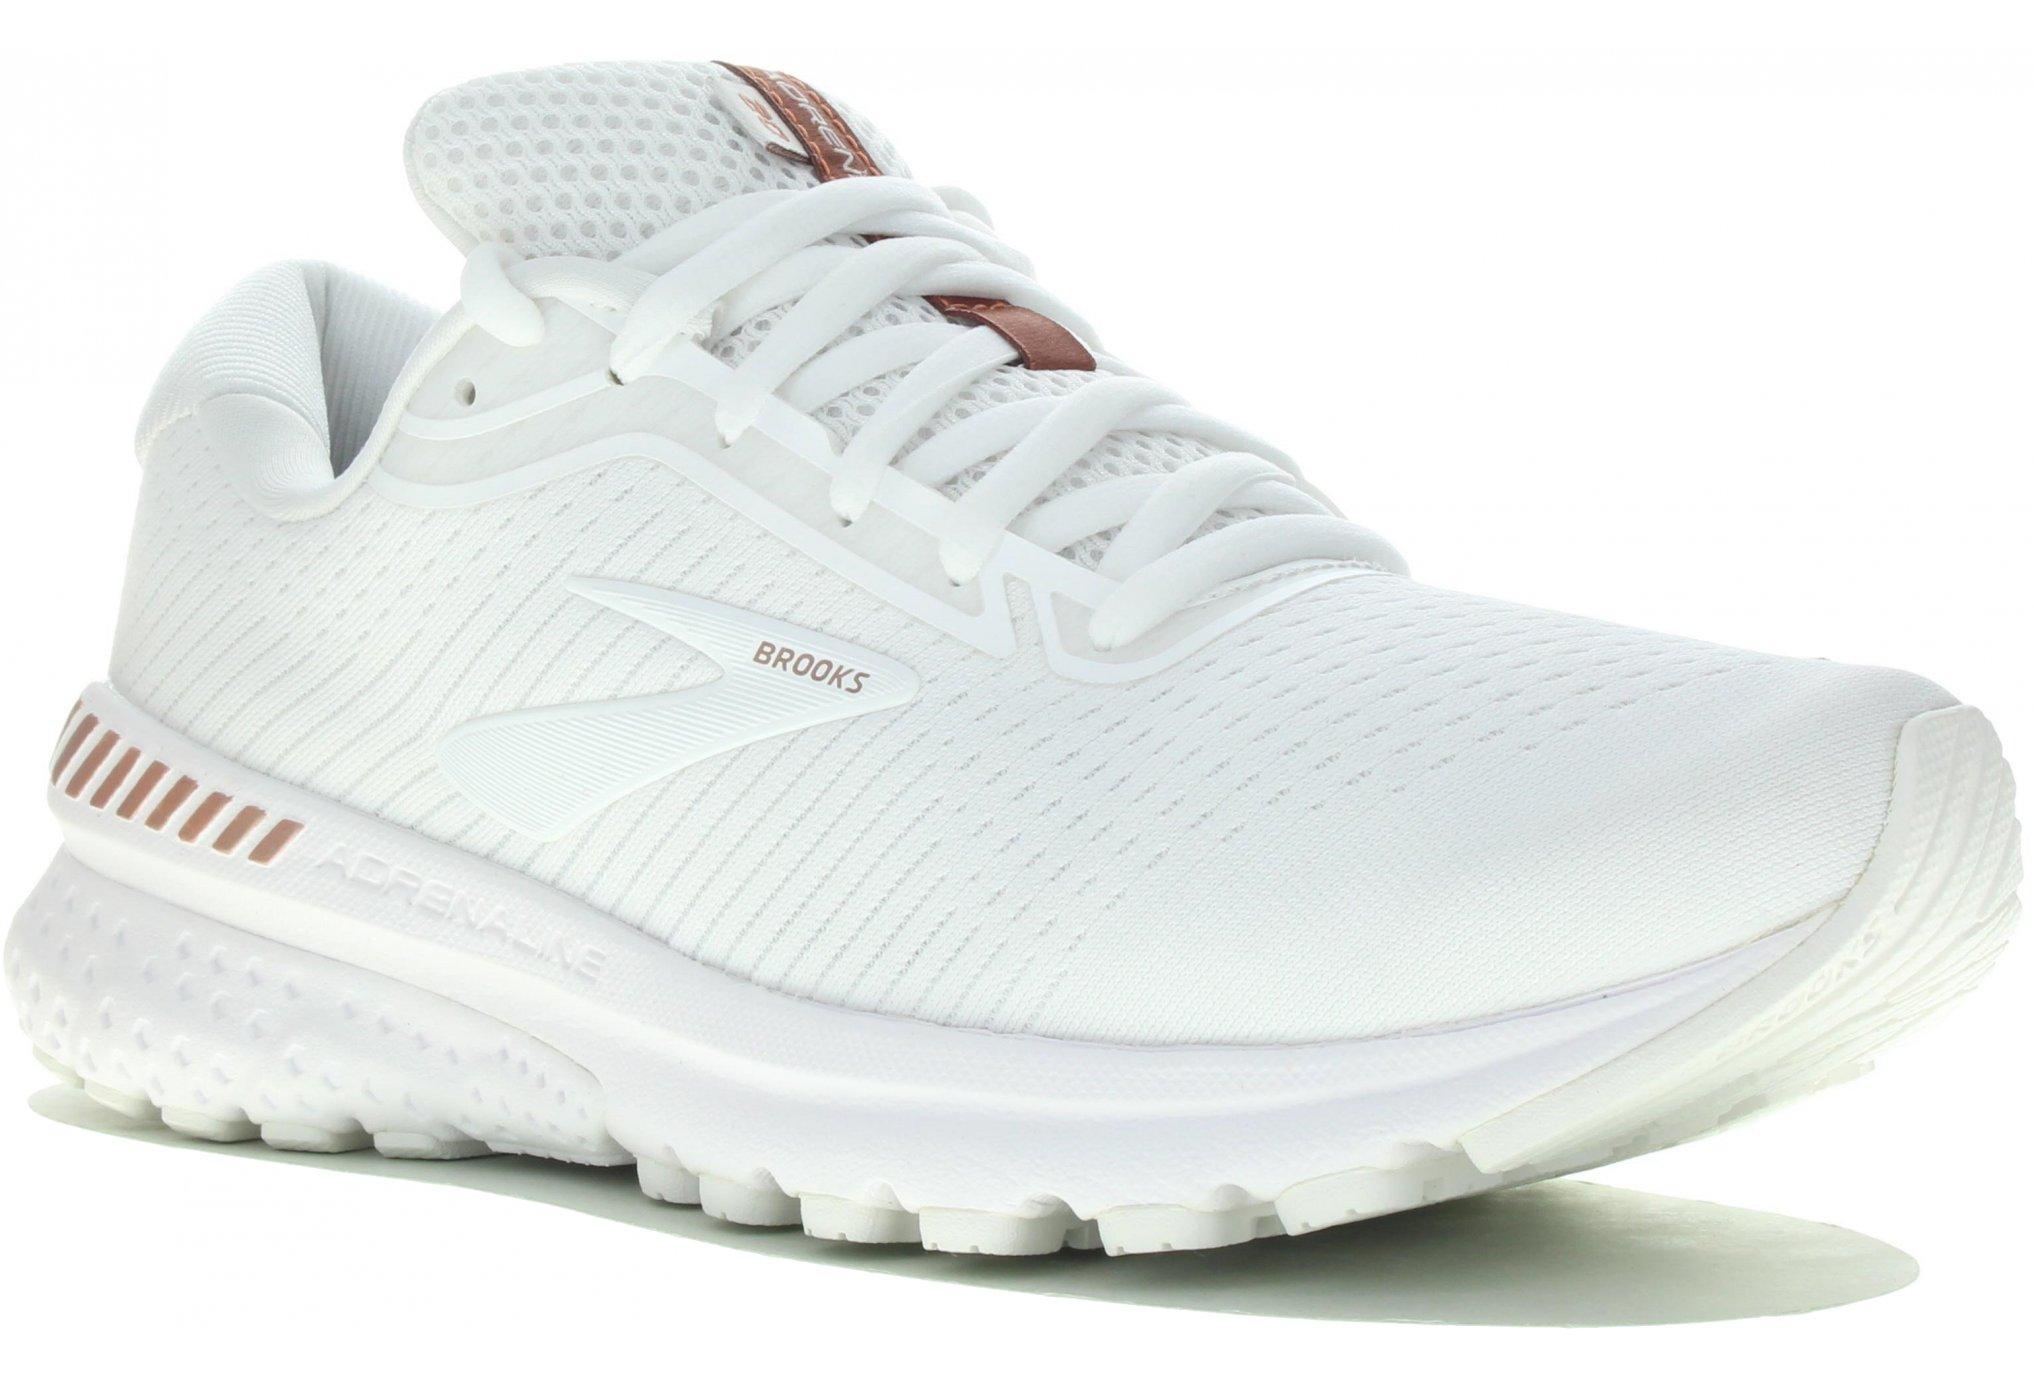 Brooks Adrenaline GTS 20 Chaussures running femme